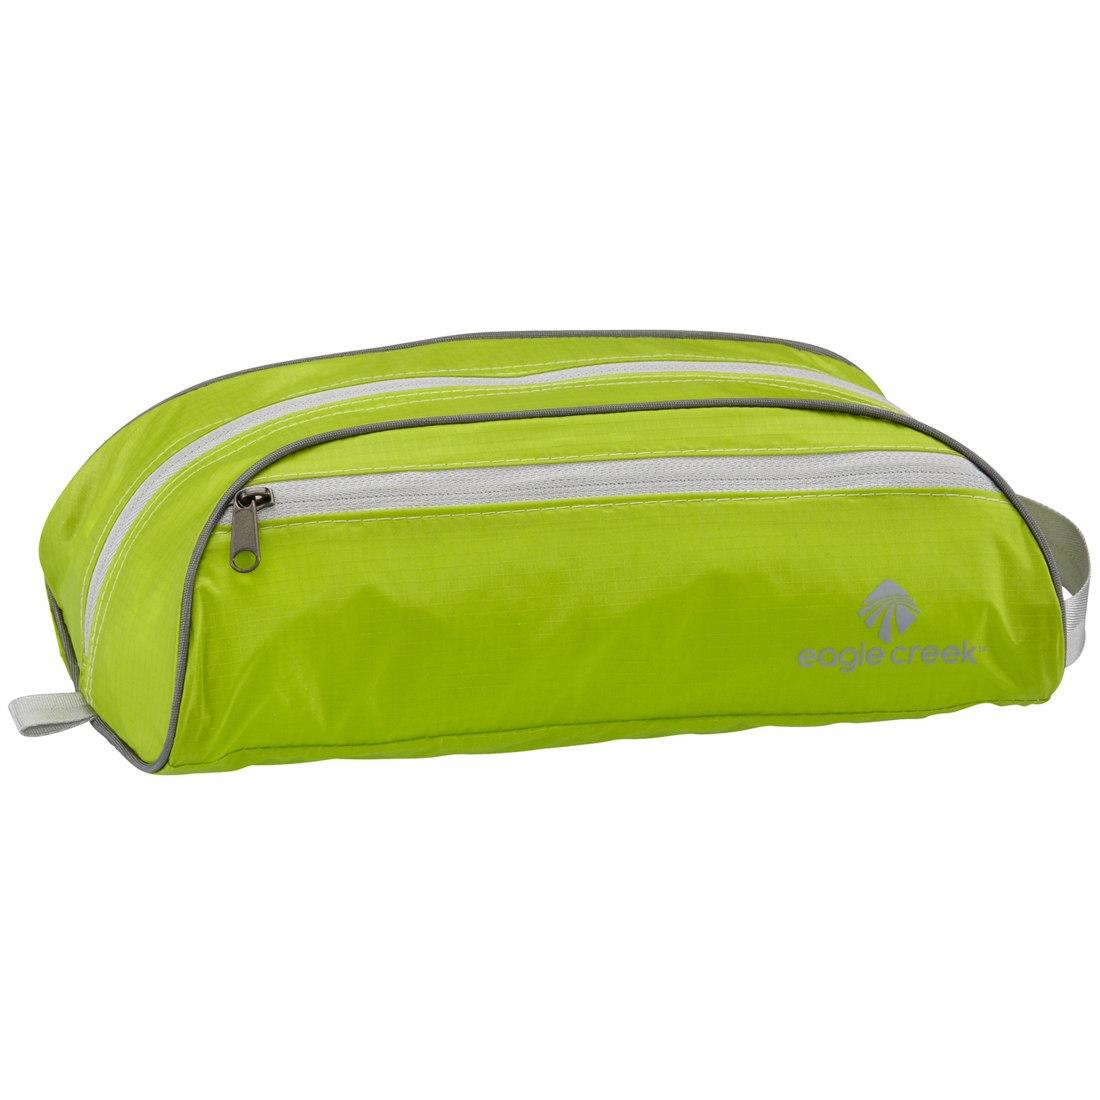 Eagle Creek Pack-It Specter Quick Trip Washbag - strobe green